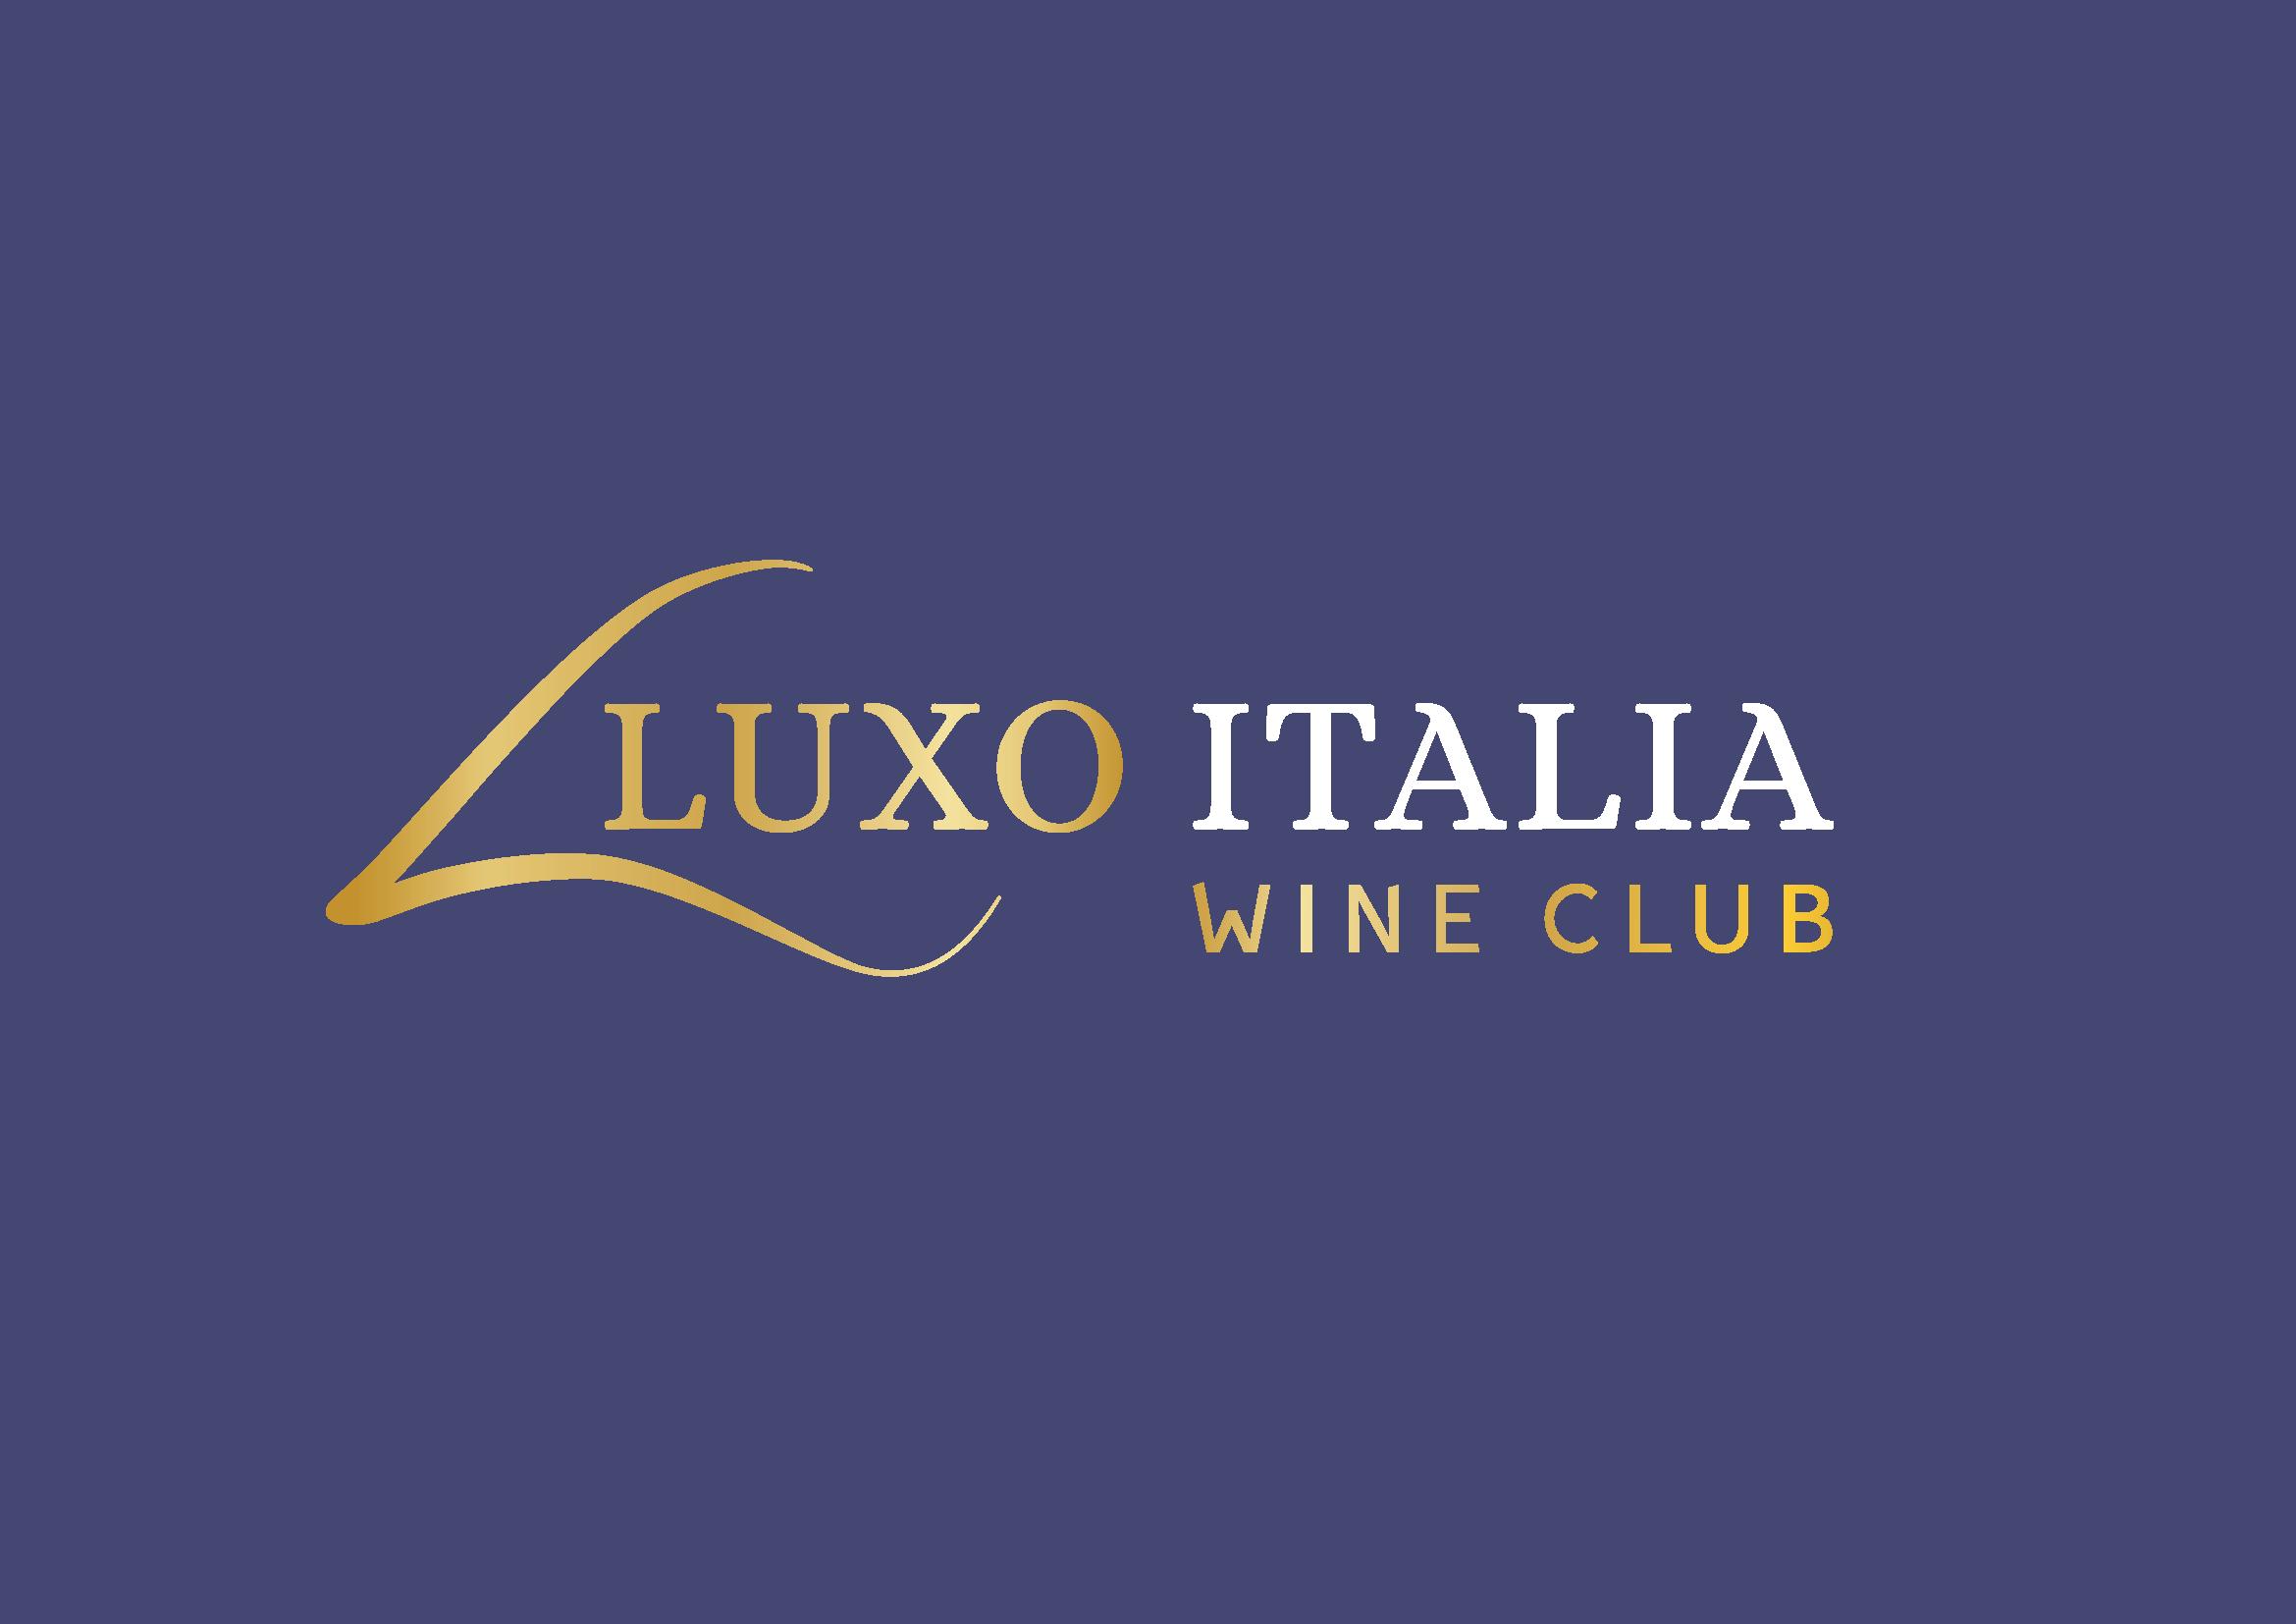 luxo italia wine club